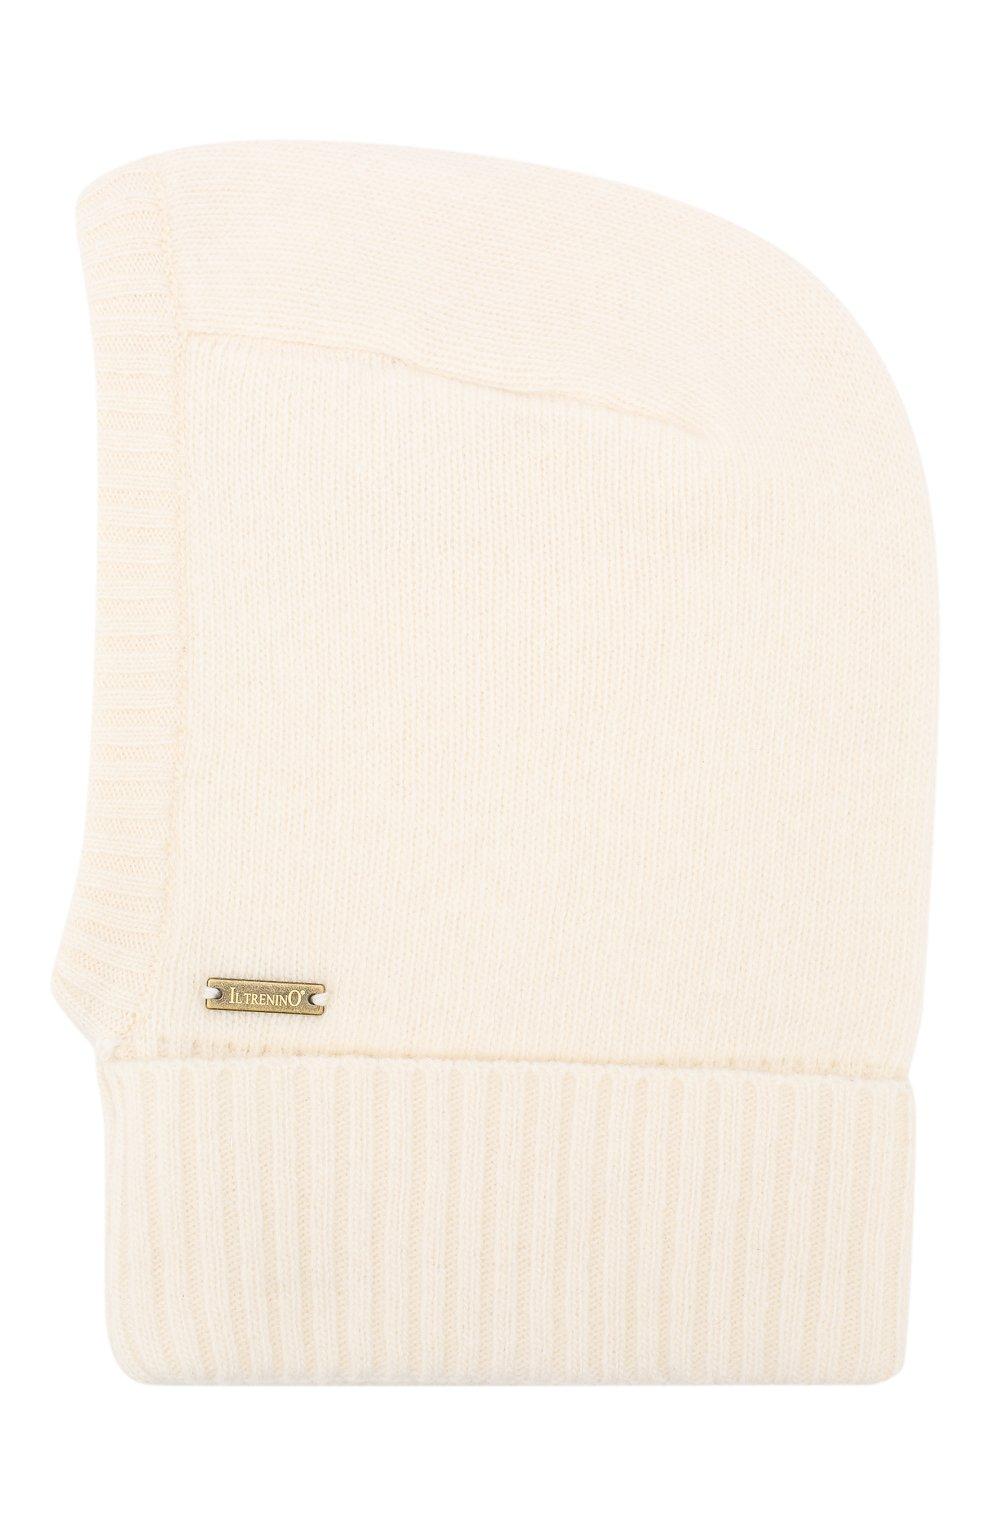 Детского шапка-балаклава из шерсти и кашемира IL TRENINO белого цвета, арт. 18 7529/E0 | Фото 2